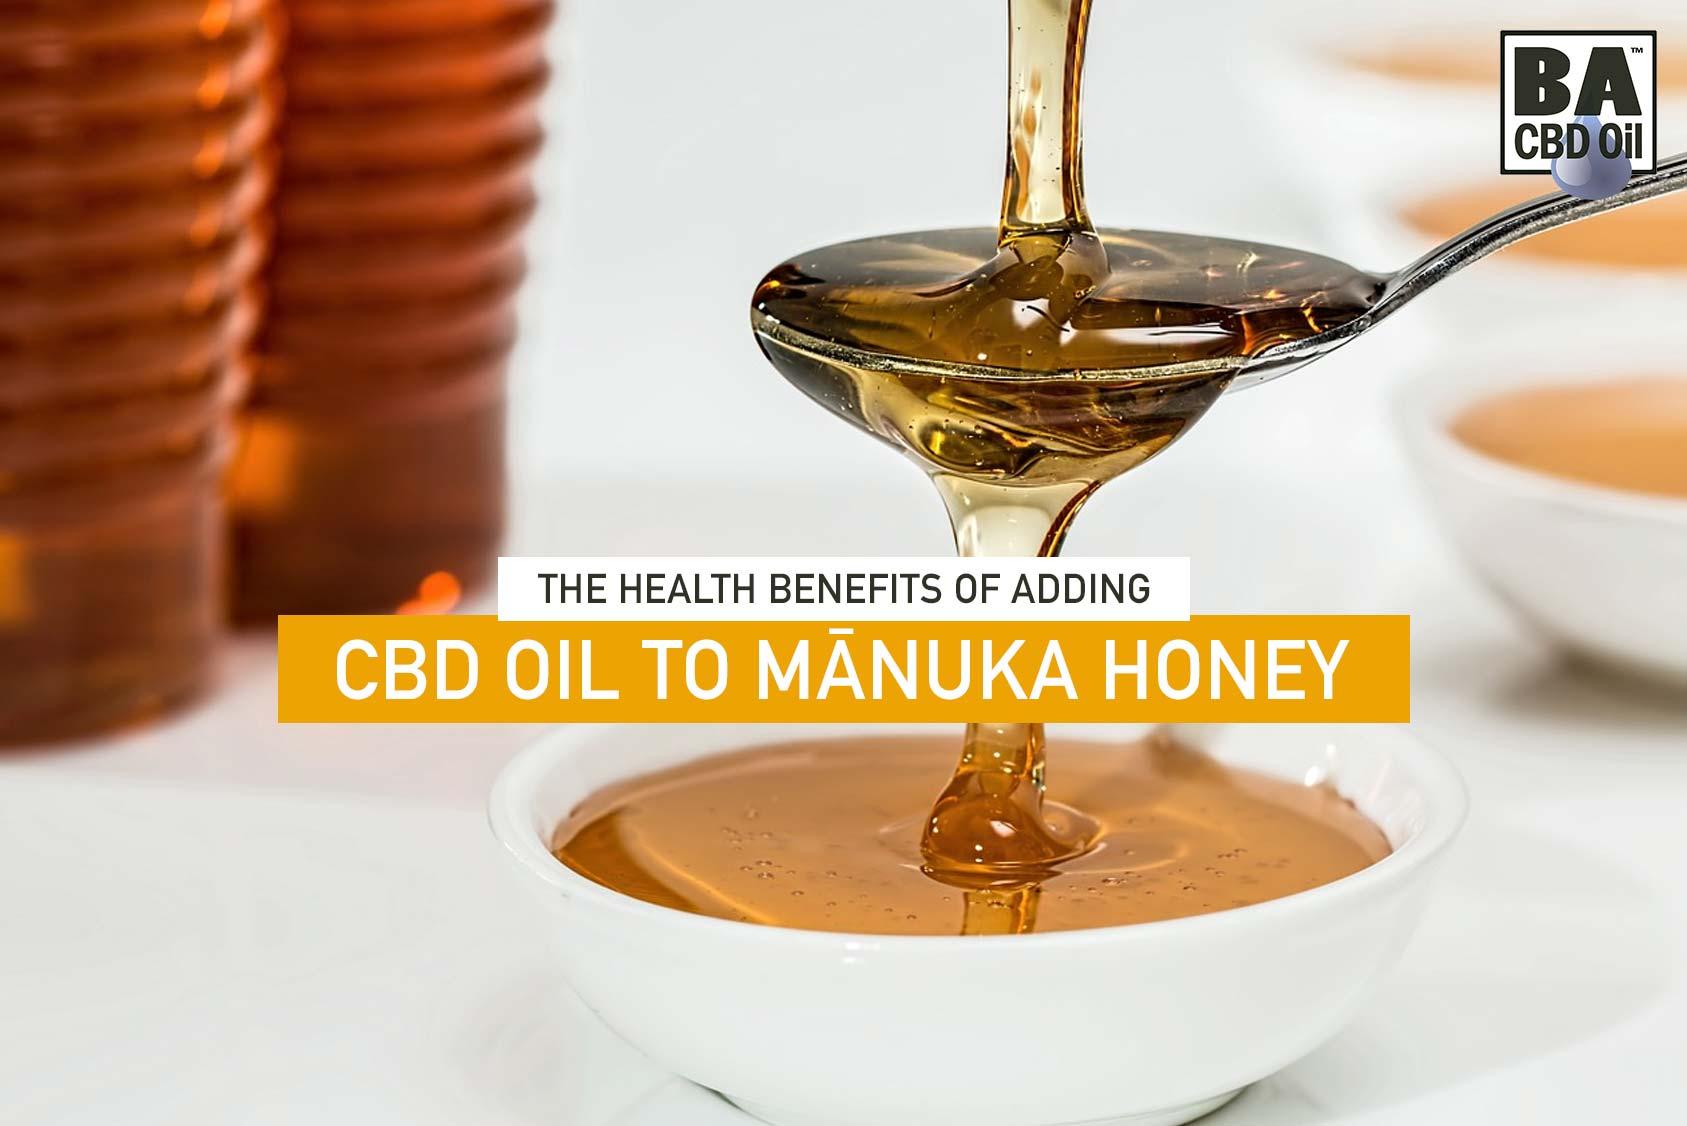 Health Benefits Of Adding CBD Oil